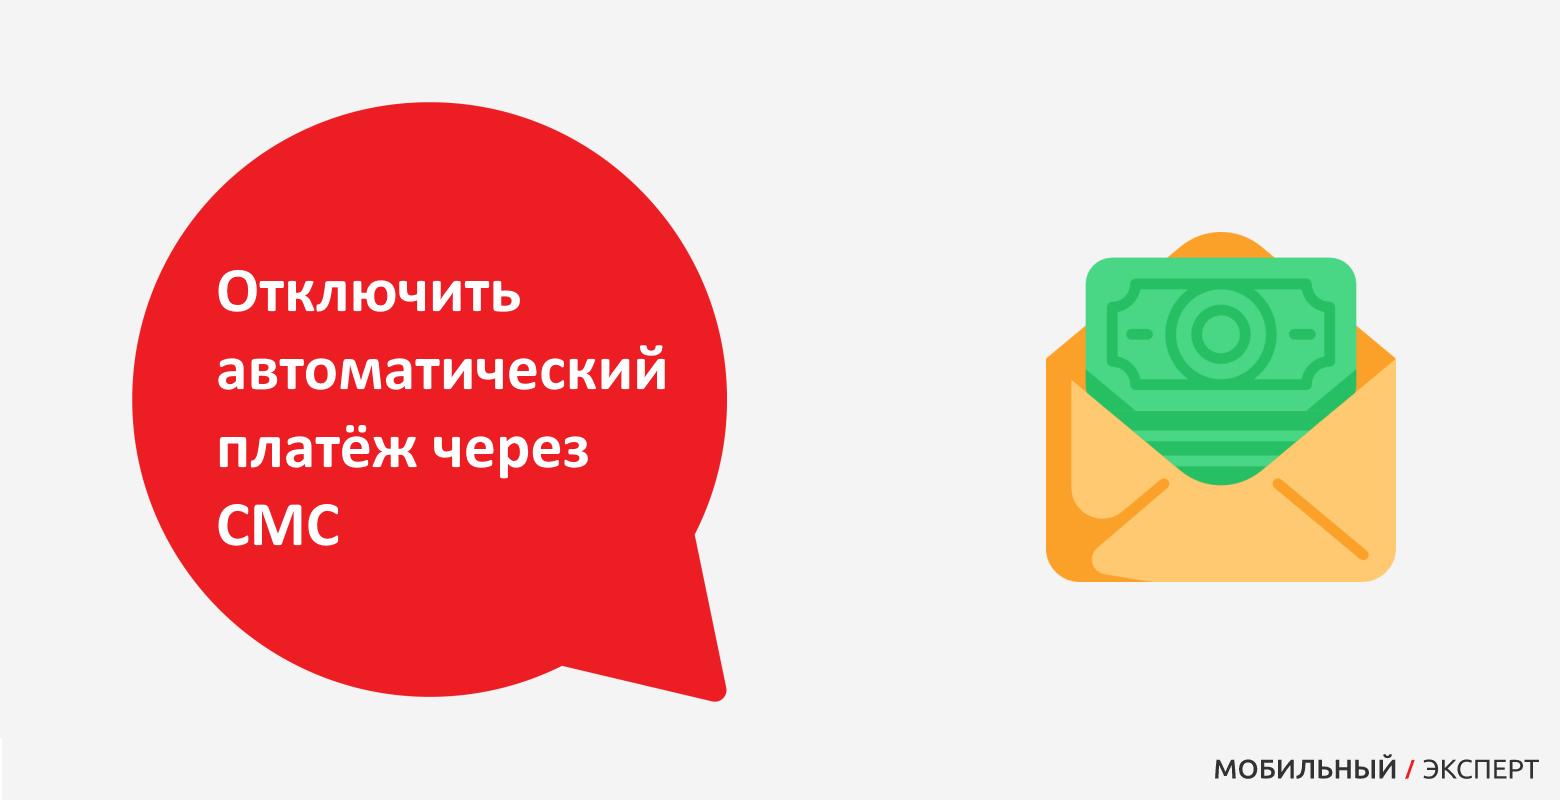 Отключить платёж через СМС